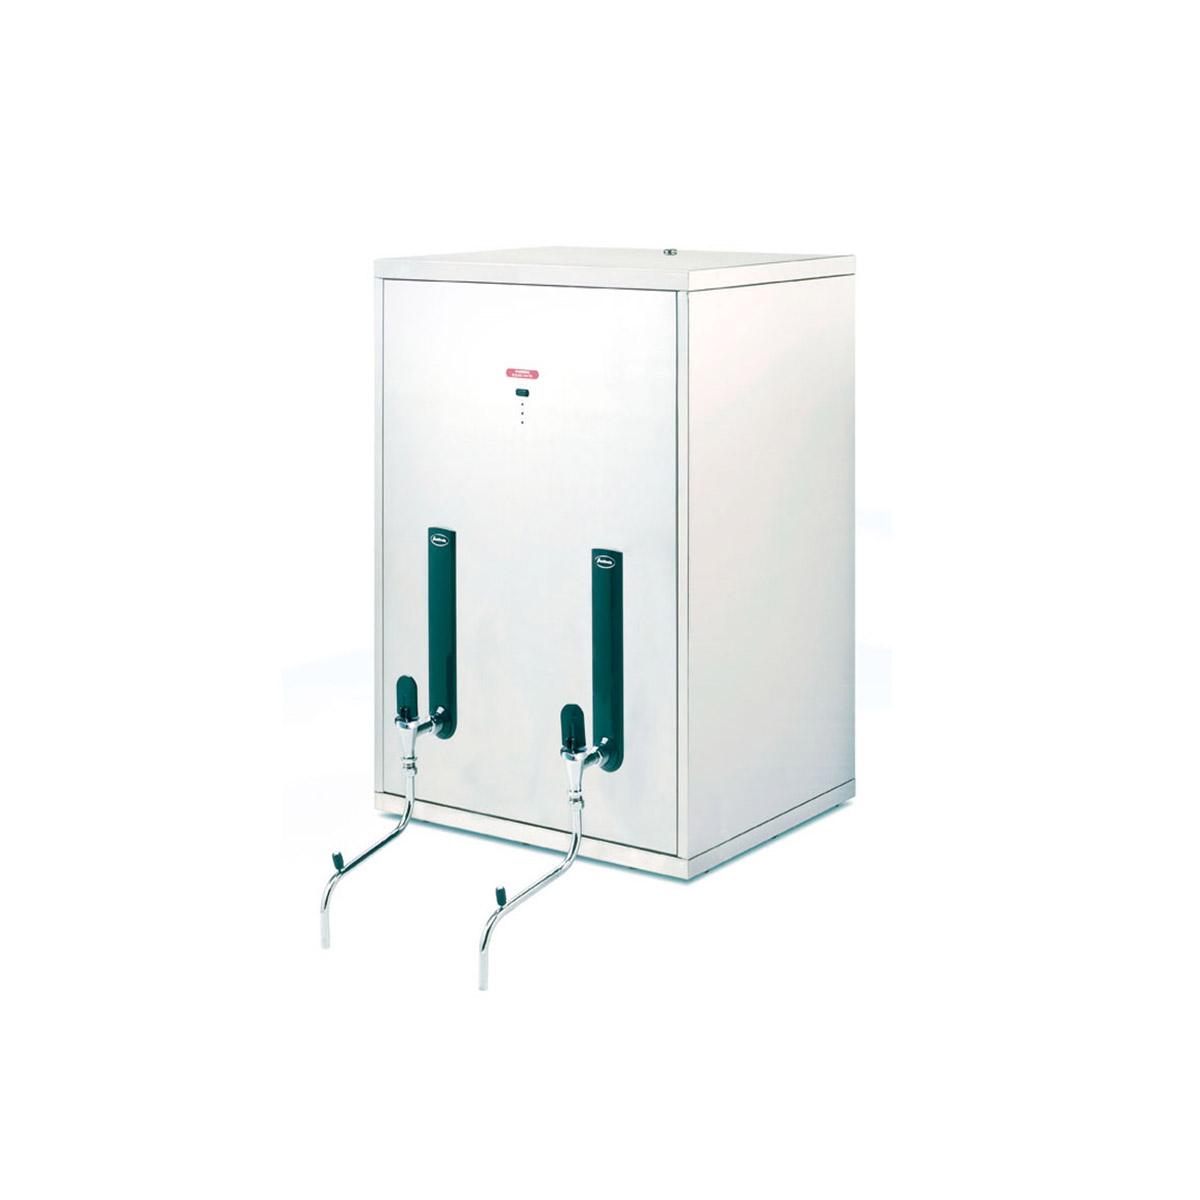 Instanta Sureflow High Volume Counter Top Water Boiler CTSV135T/18 Twin Taps 135Ltr